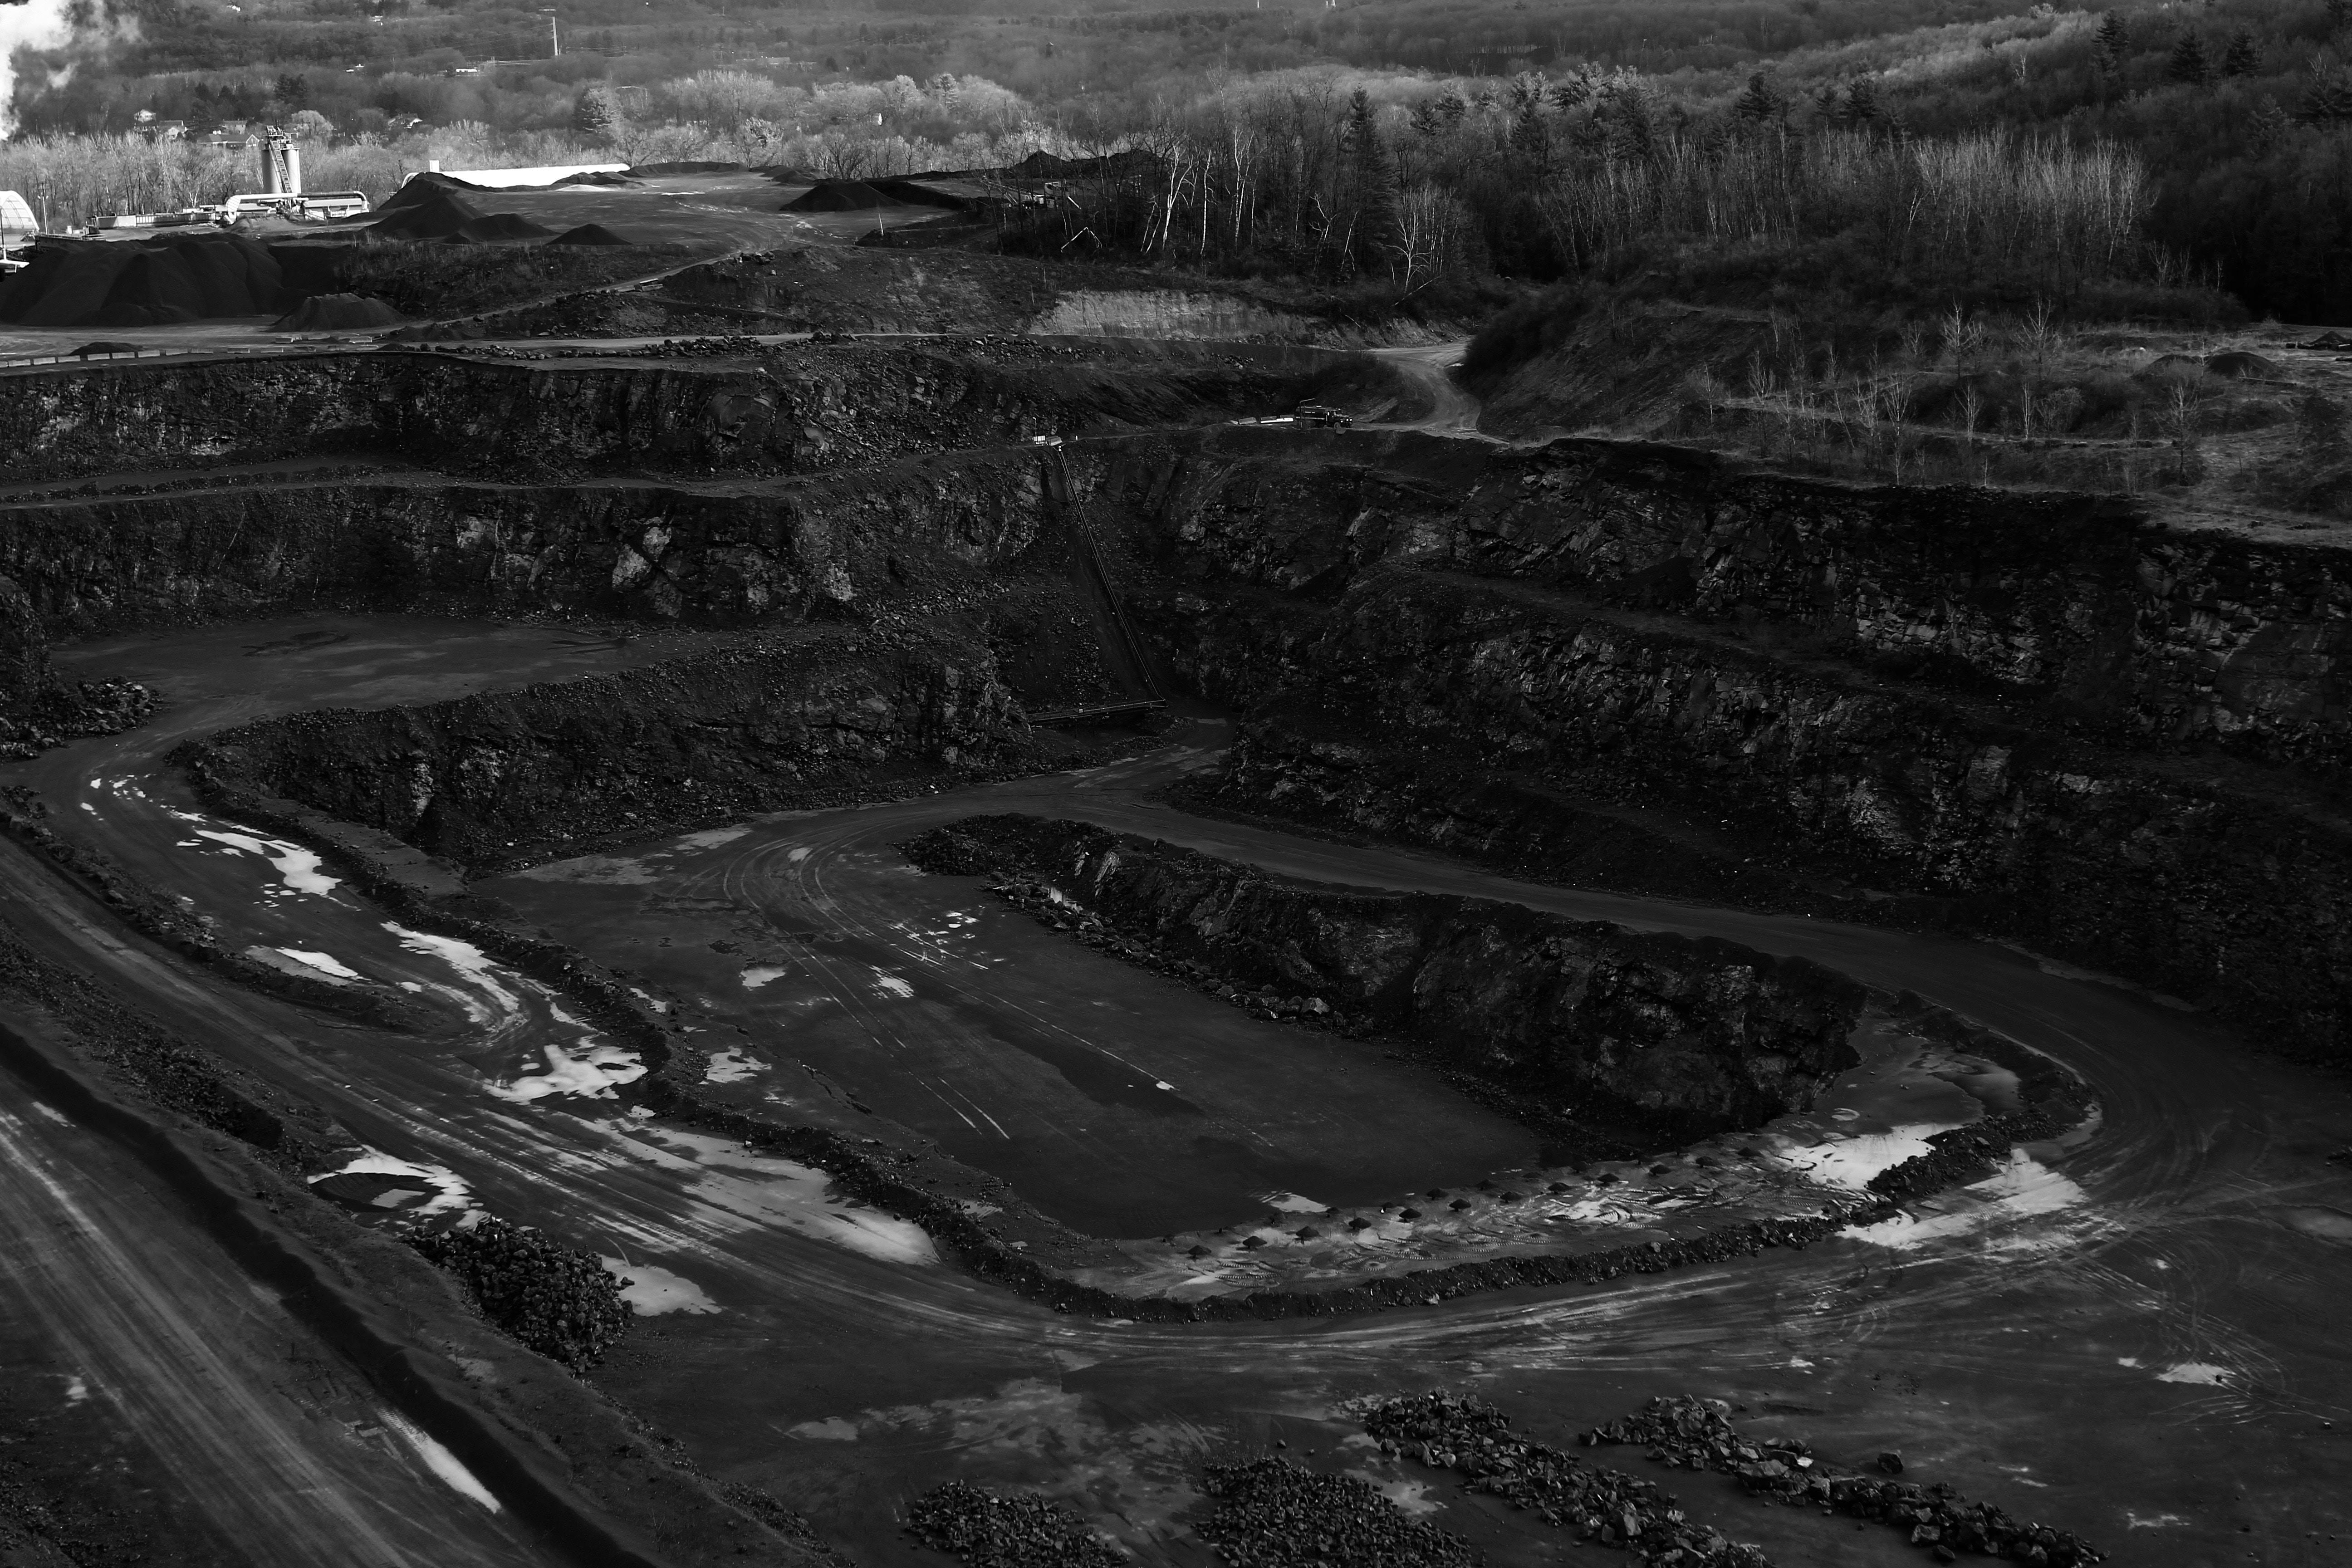 coal mining CAT equipment wagner equipment co